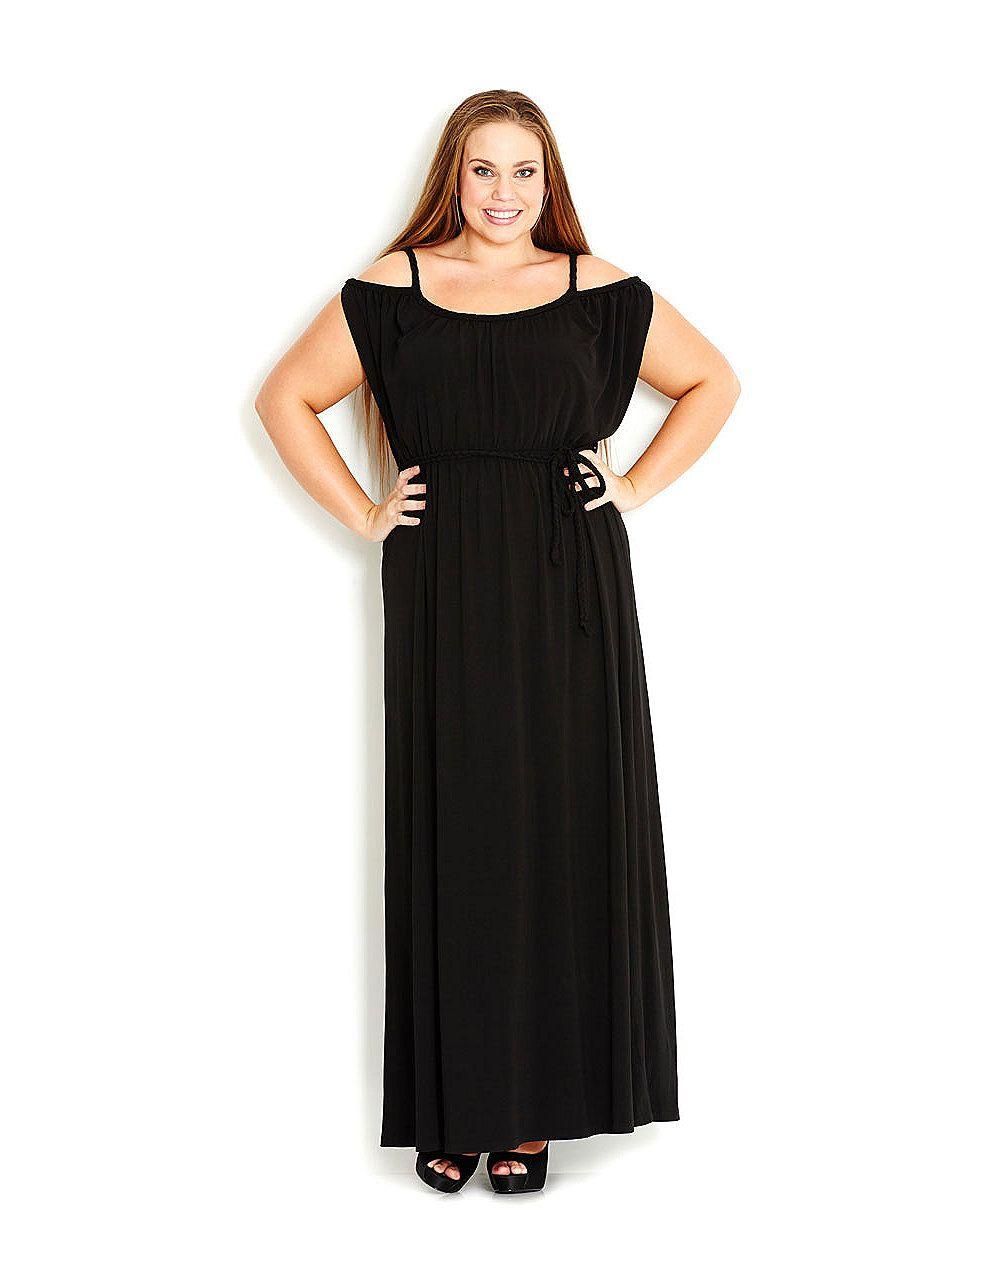 Off Shoulder Maxi Dress Sonsi Plus Size Fashion Maxi Dress Curvy Maxi Dress [ 1280 x 1000 Pixel ]